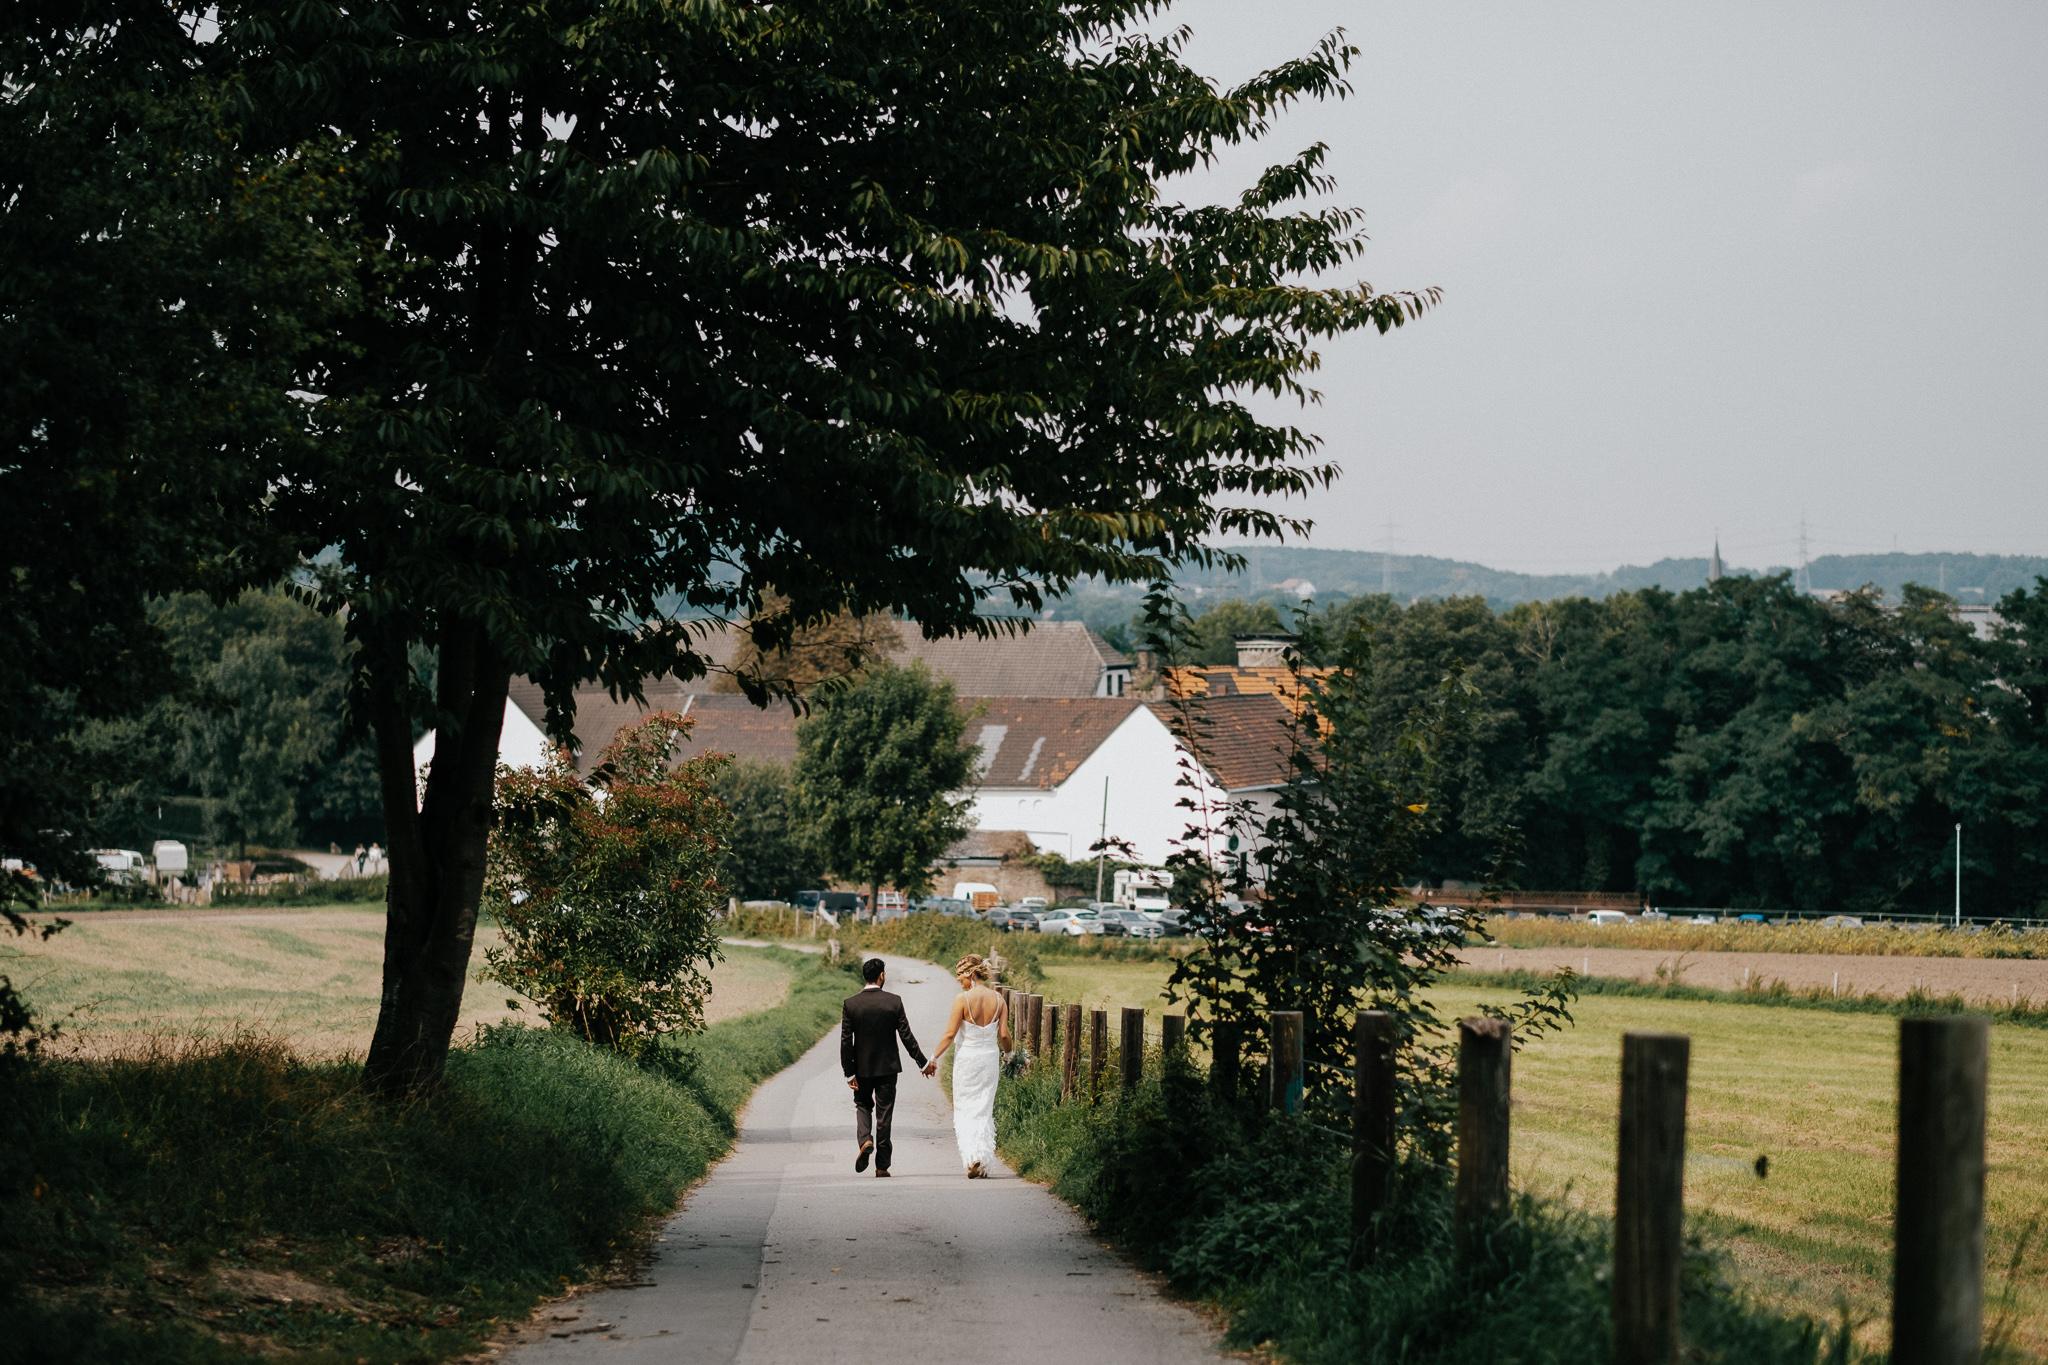 blogpost_carina und franco-0041.jpg